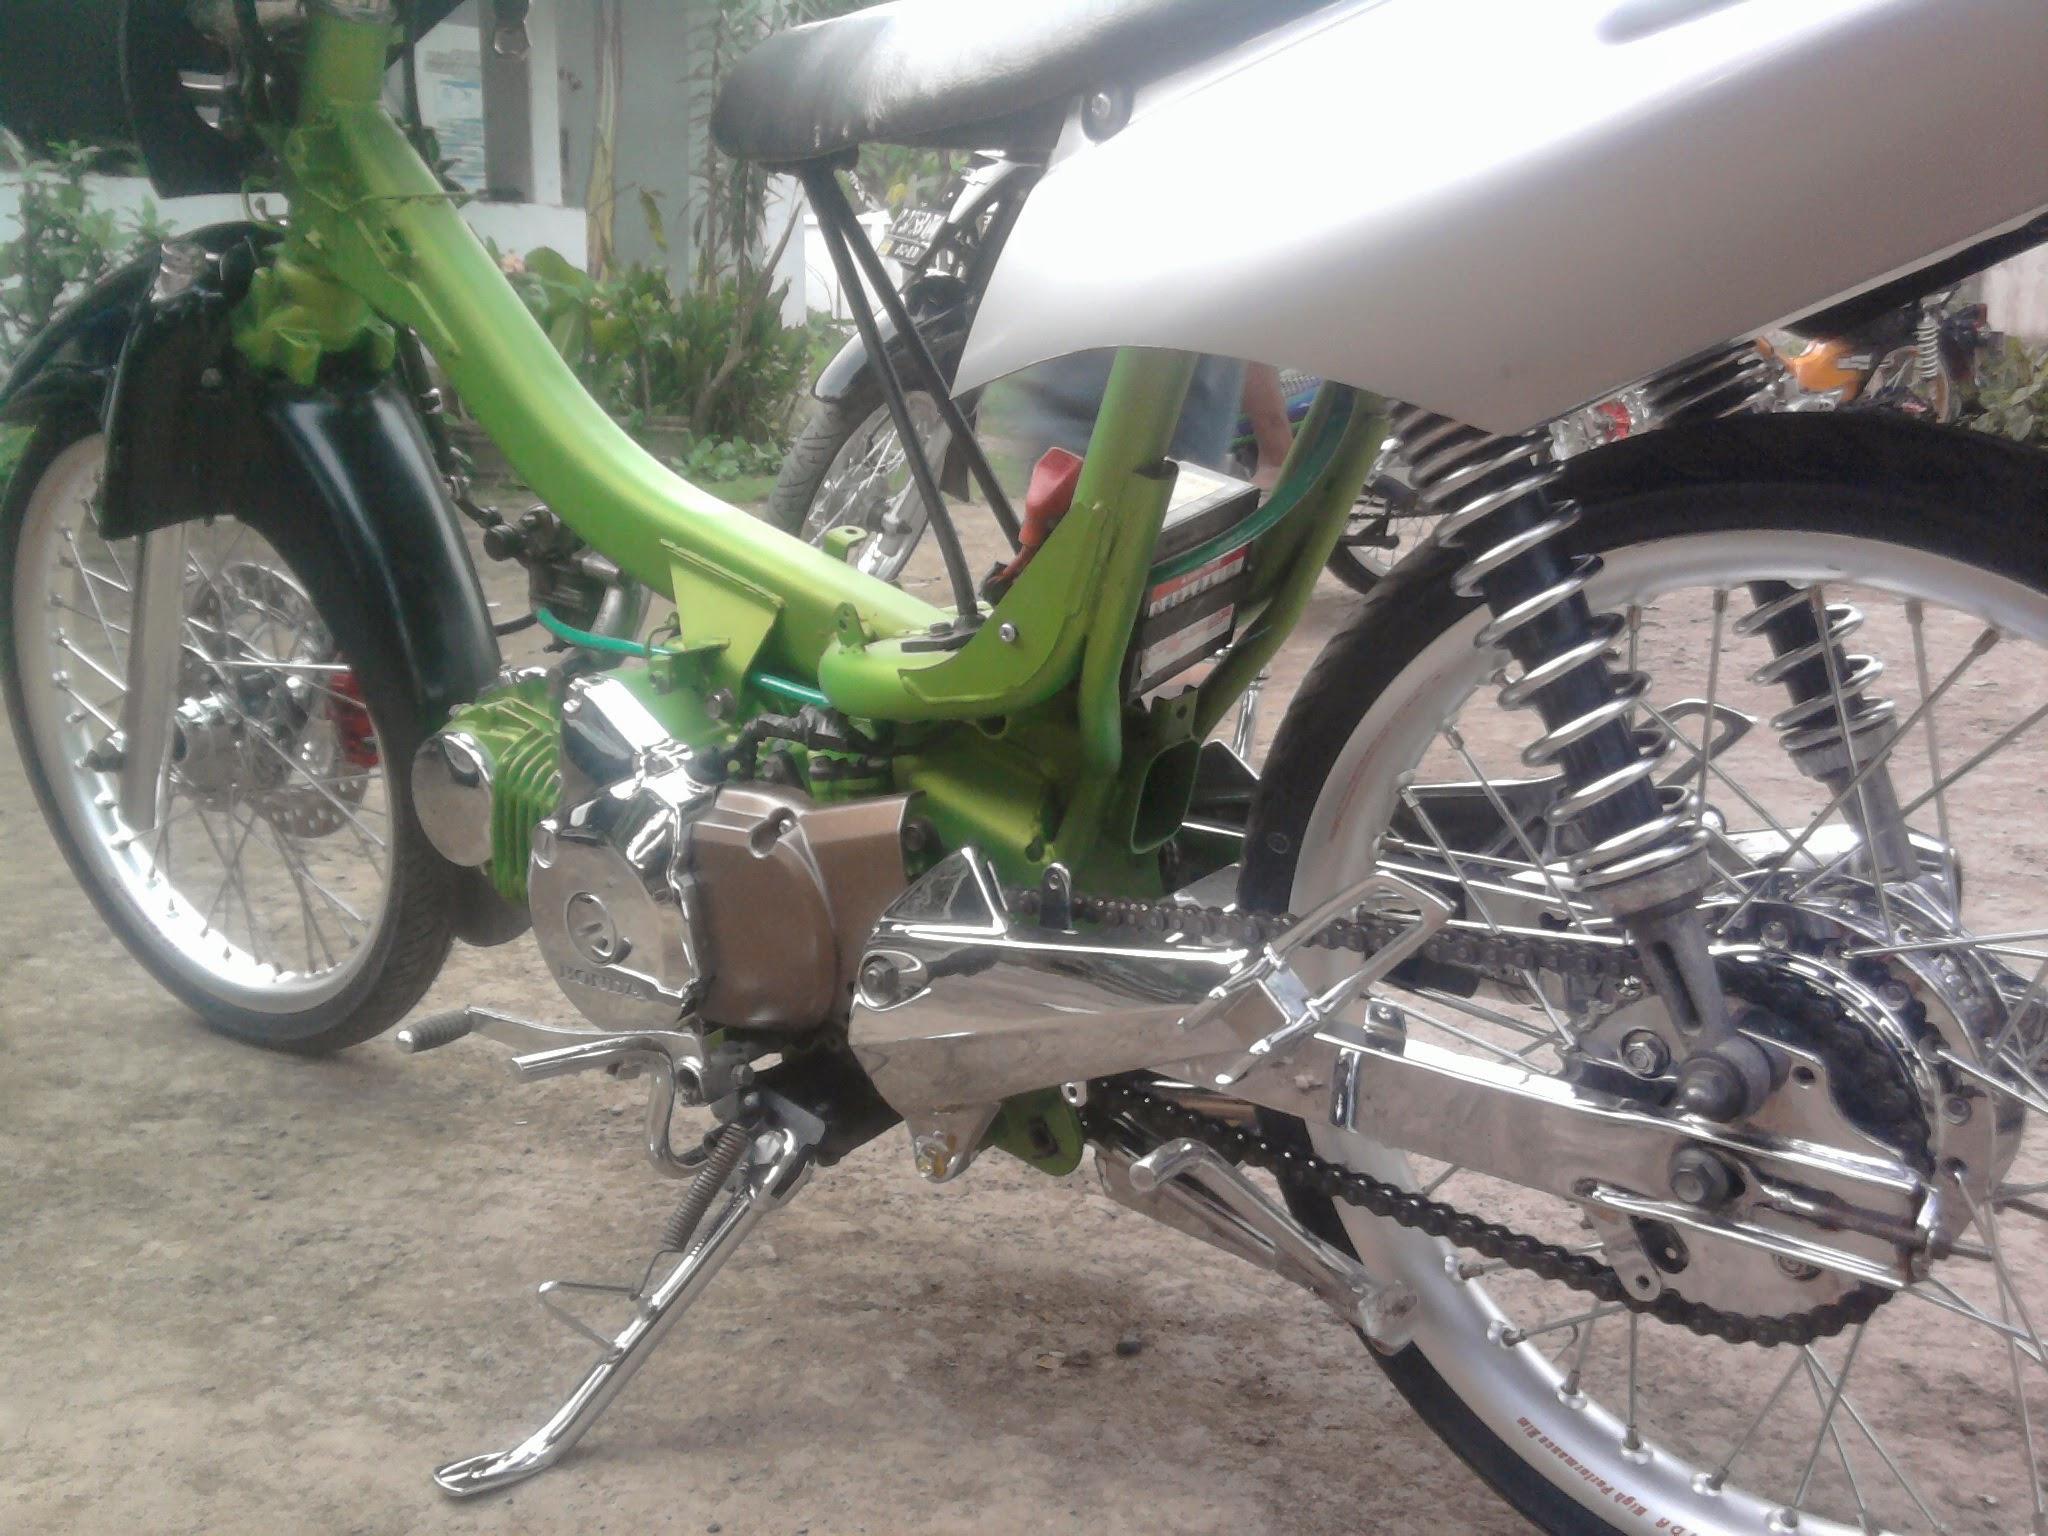 Modifikasi Honda Karisma 125 Thecitycyclist